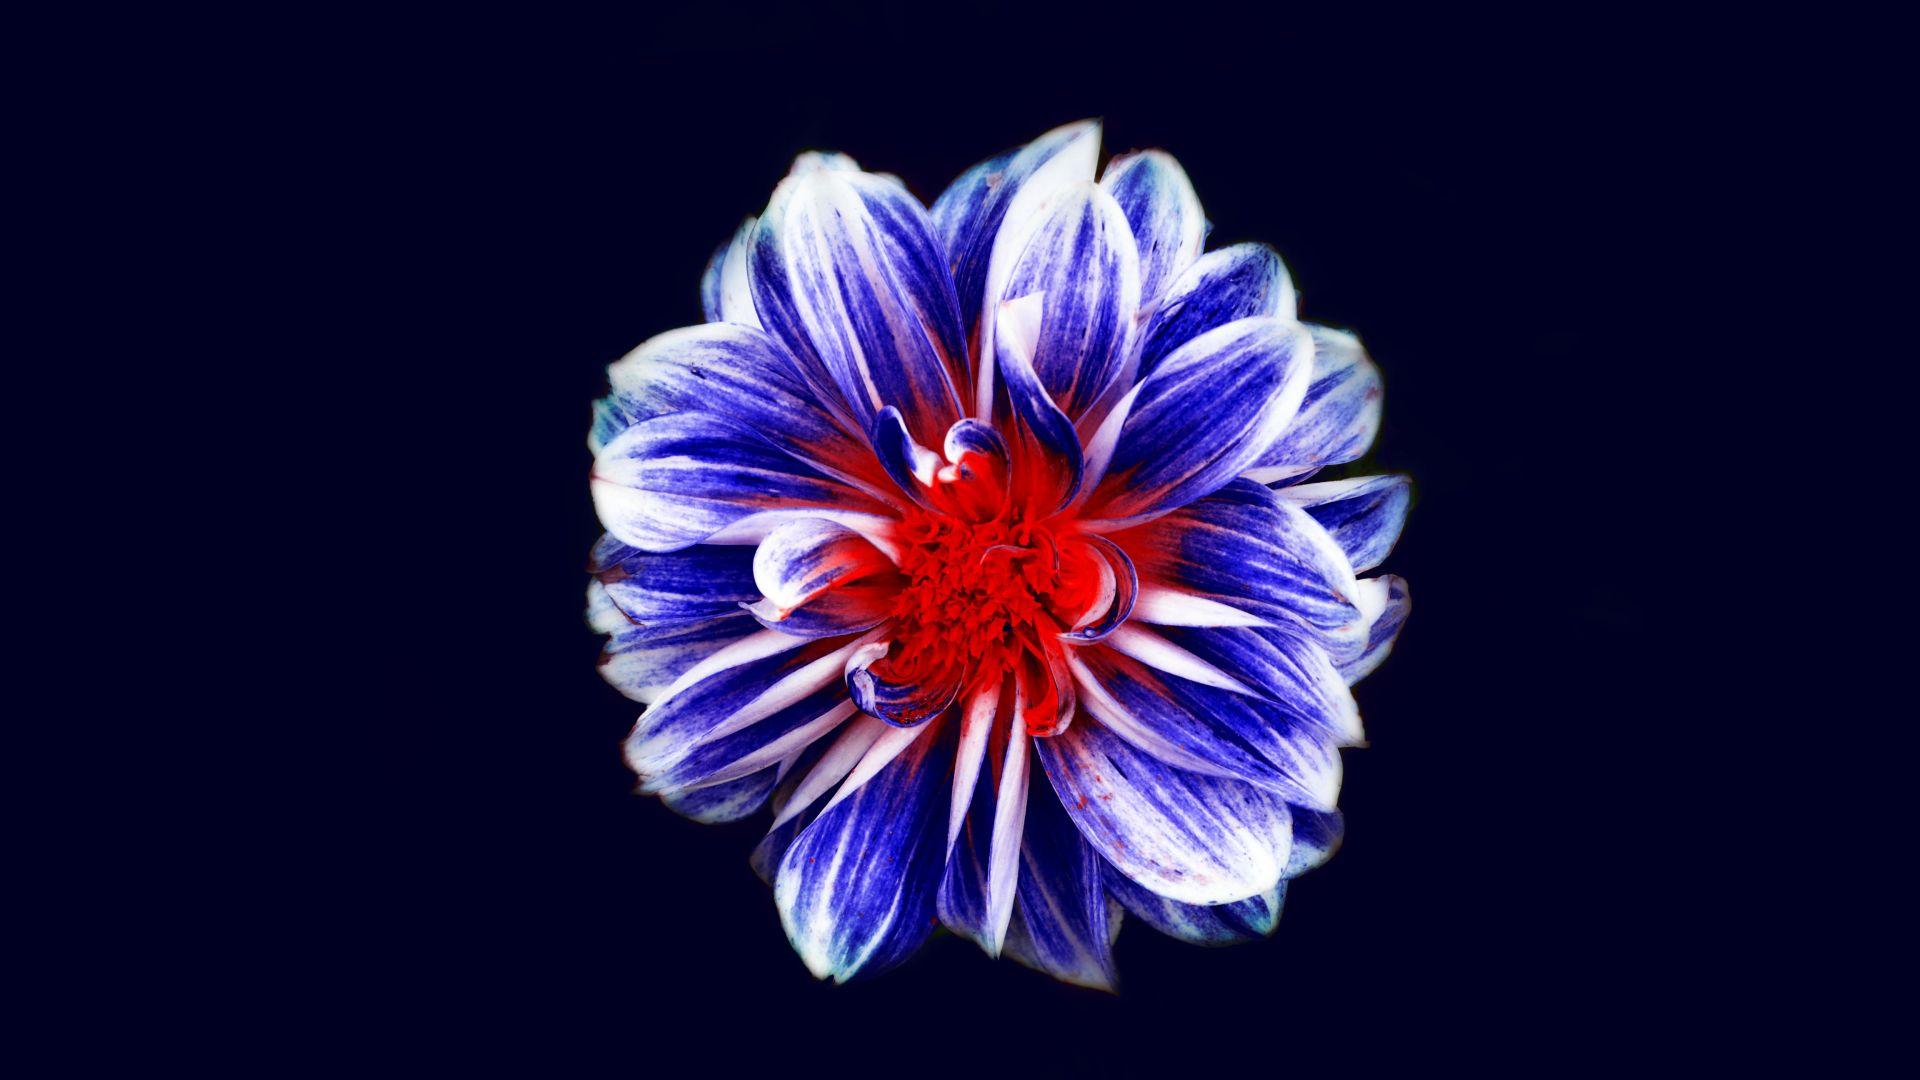 Wallpaper Blue flower, digital art, 4k